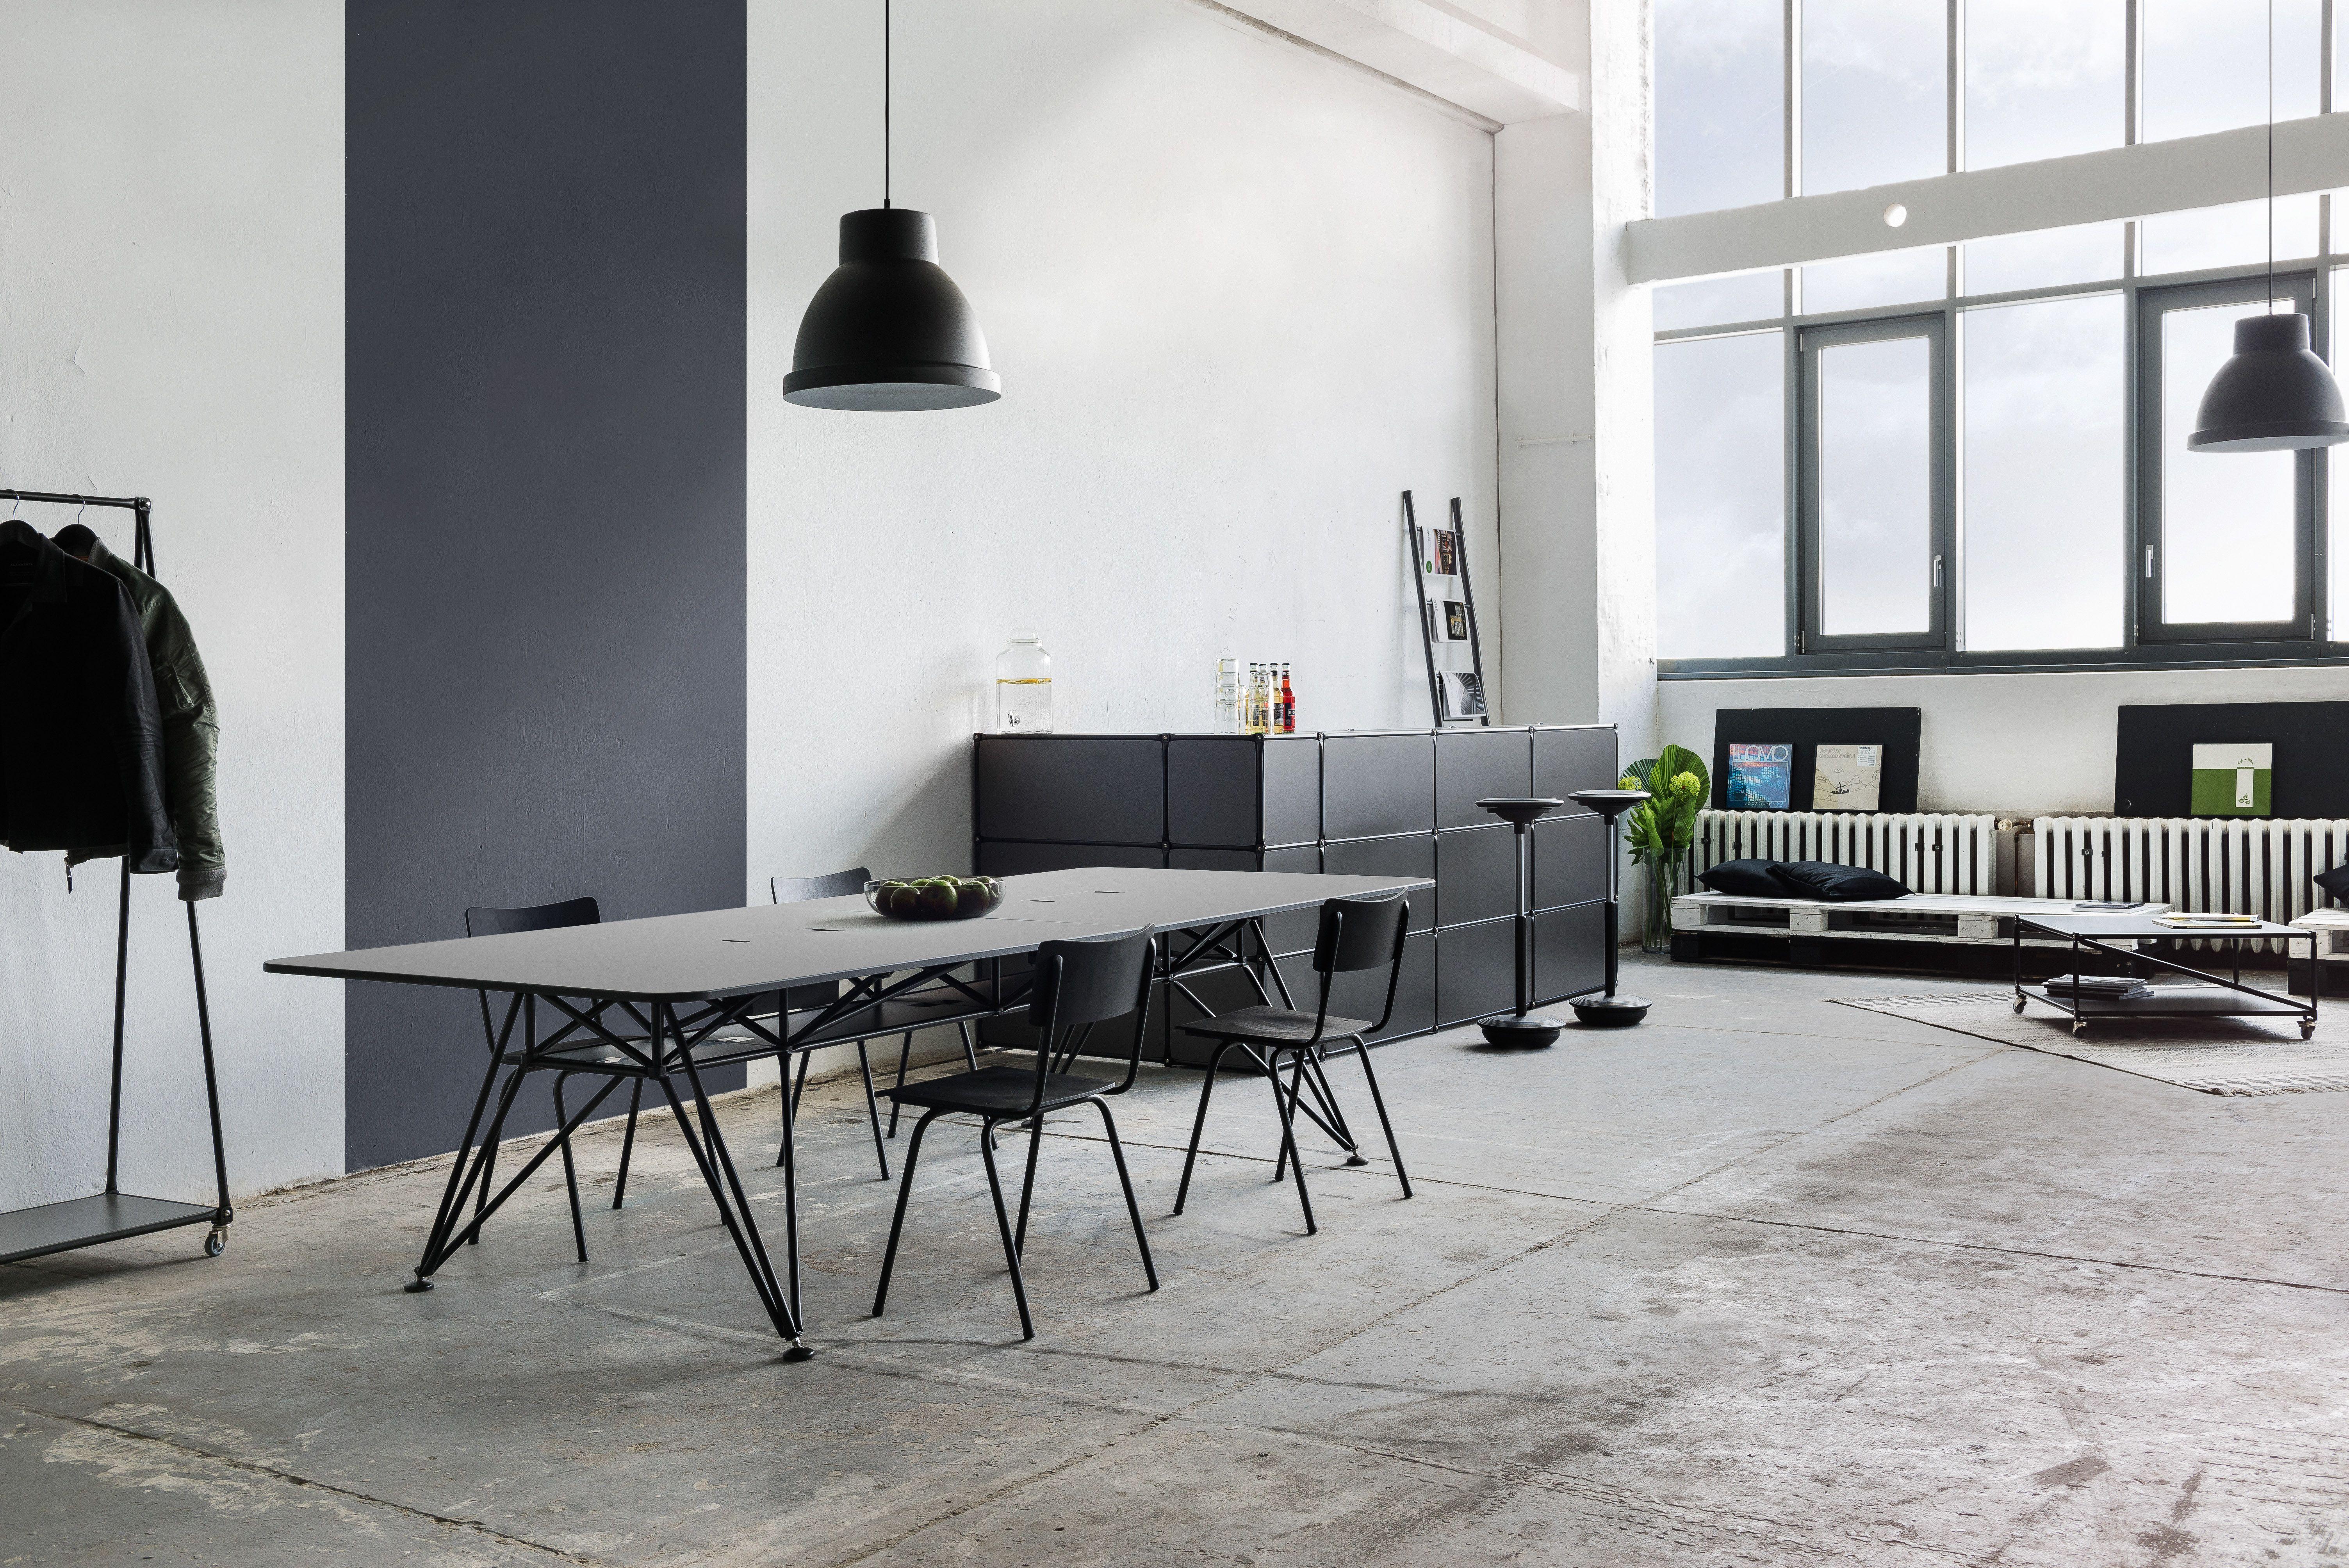 K Serie Conference Table With Matt Black Powdered Finish Black Line Modular Counter And Coatrack All Furniture A Konferenztisch Mobel Bestellen Einrichtung